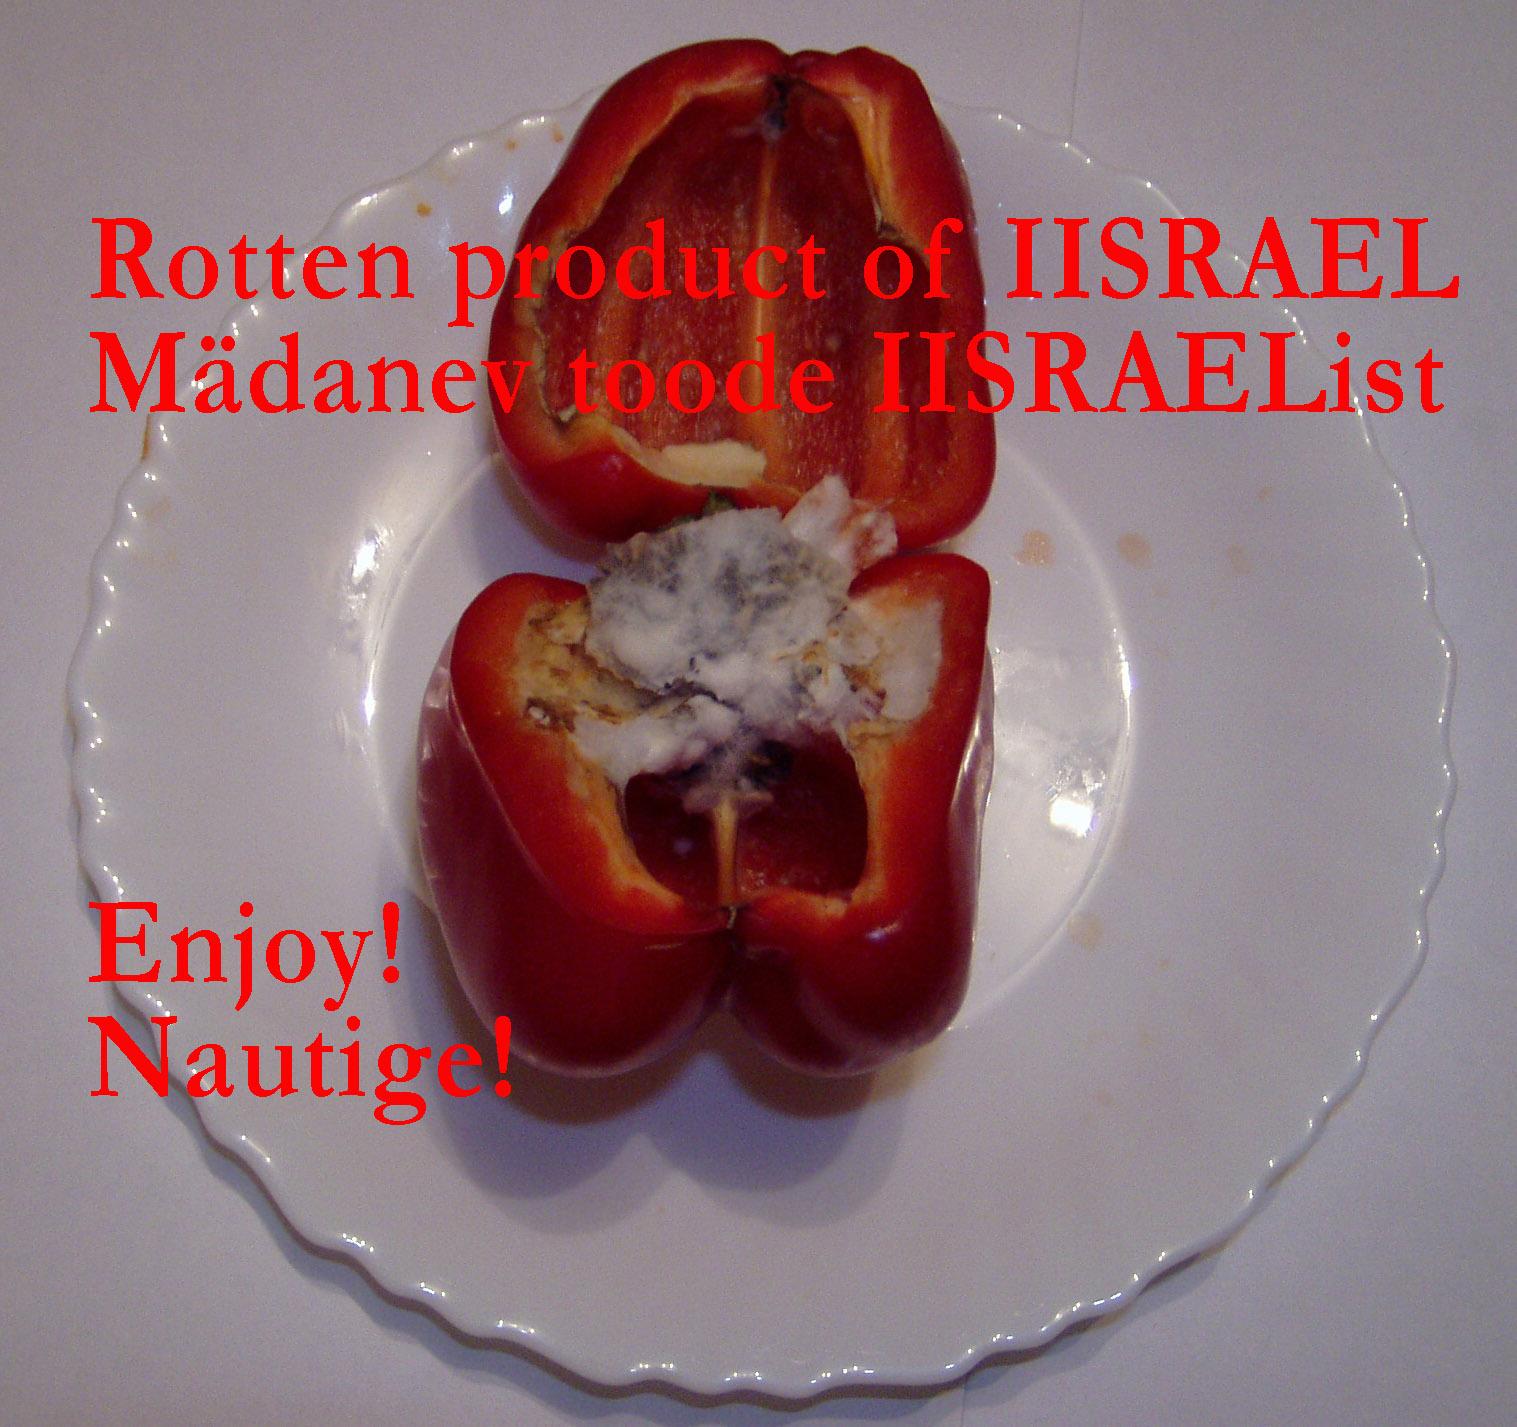 0808864_hallitav_paprica_rotten_product_of_israel_p1077068